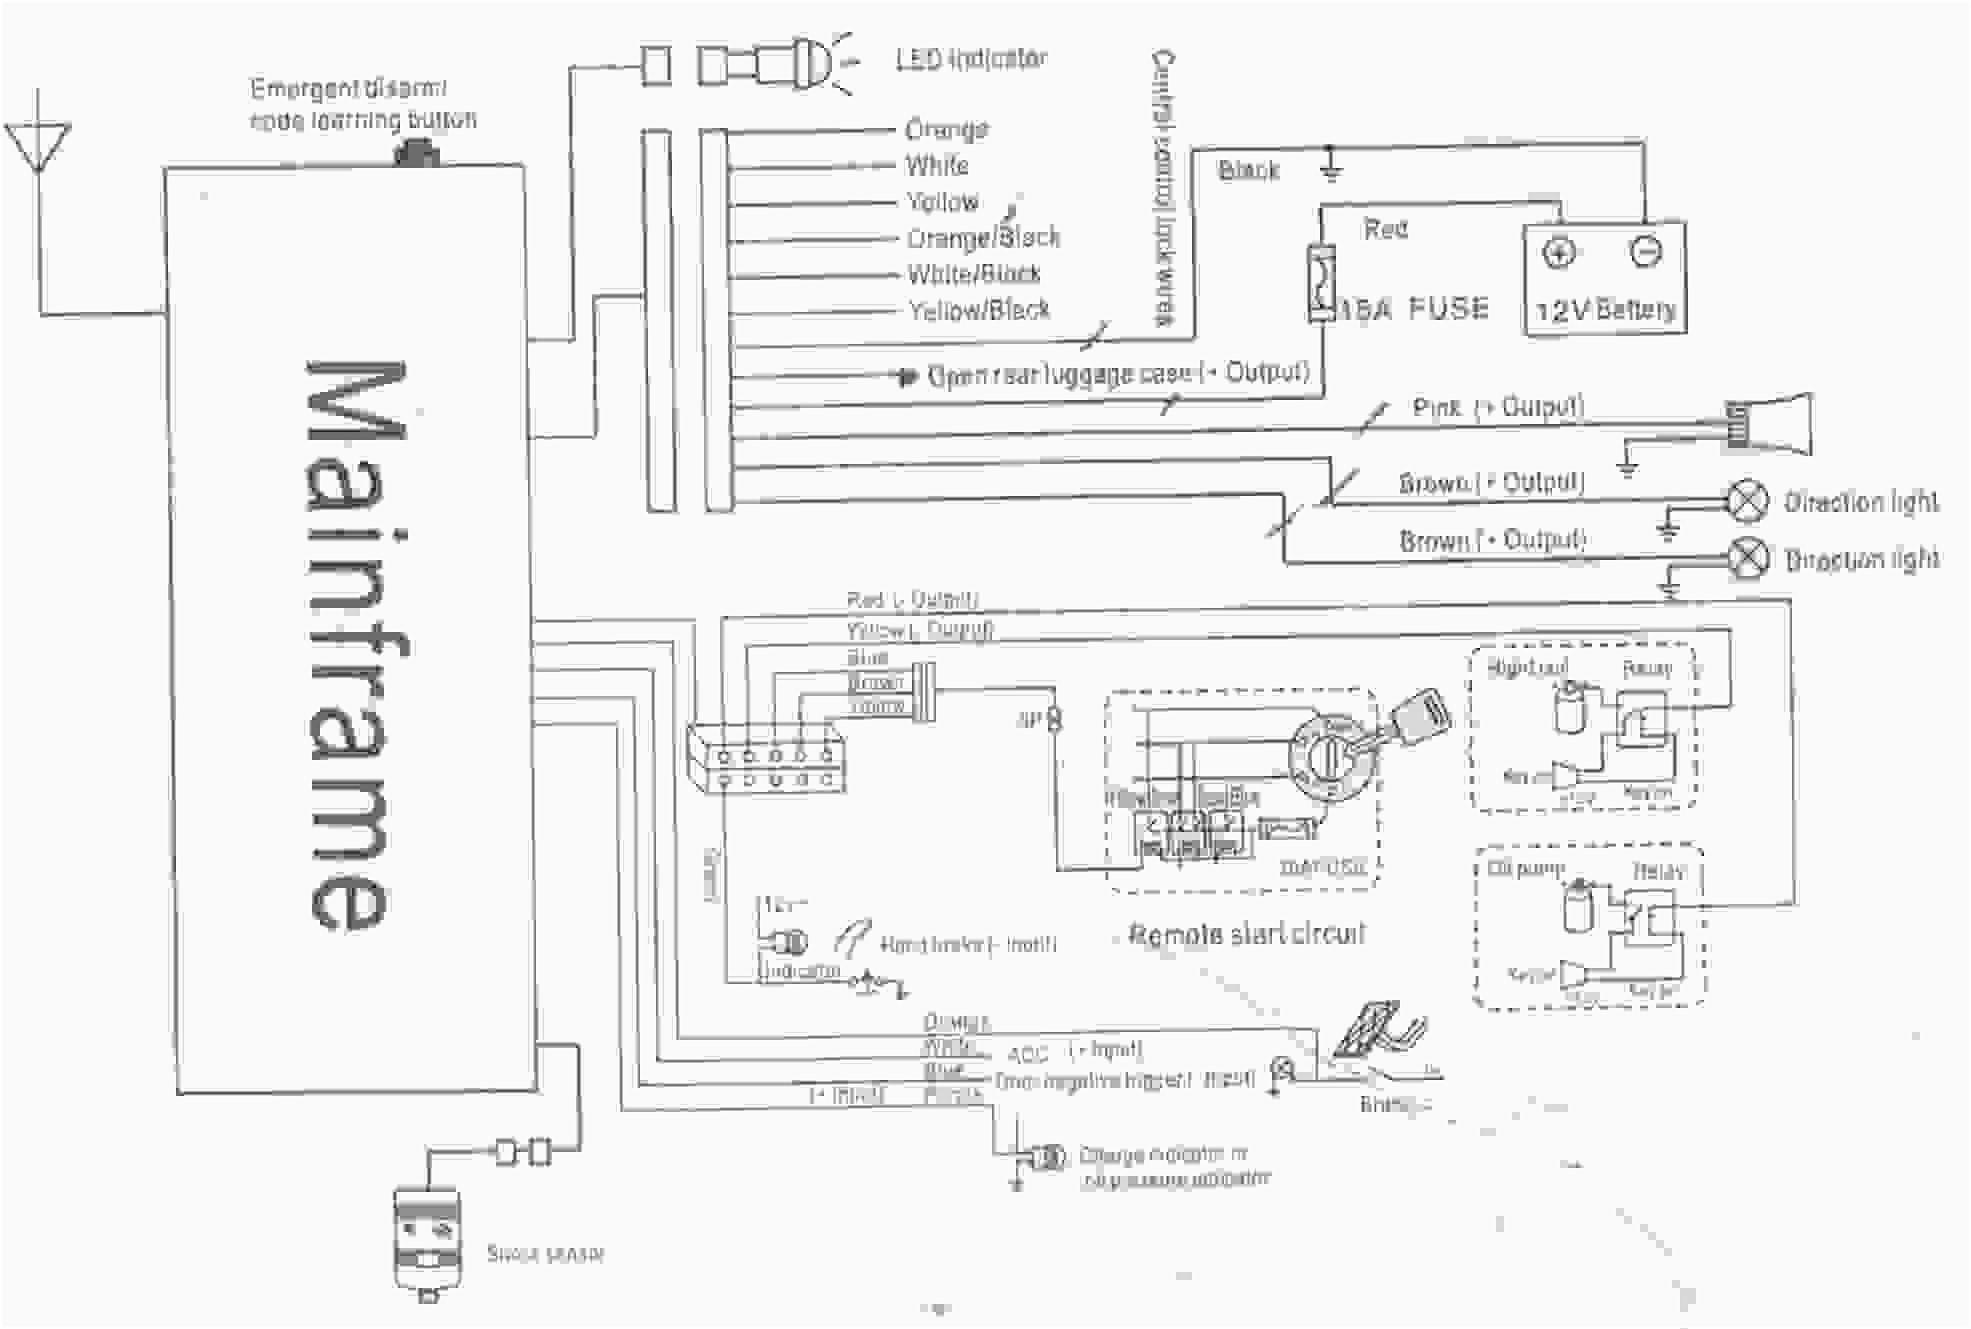 Car Voltmeter Wiring Diagram Vm 2112] for Car Alarm Wiring Diagram Of Car Voltmeter Wiring Diagram